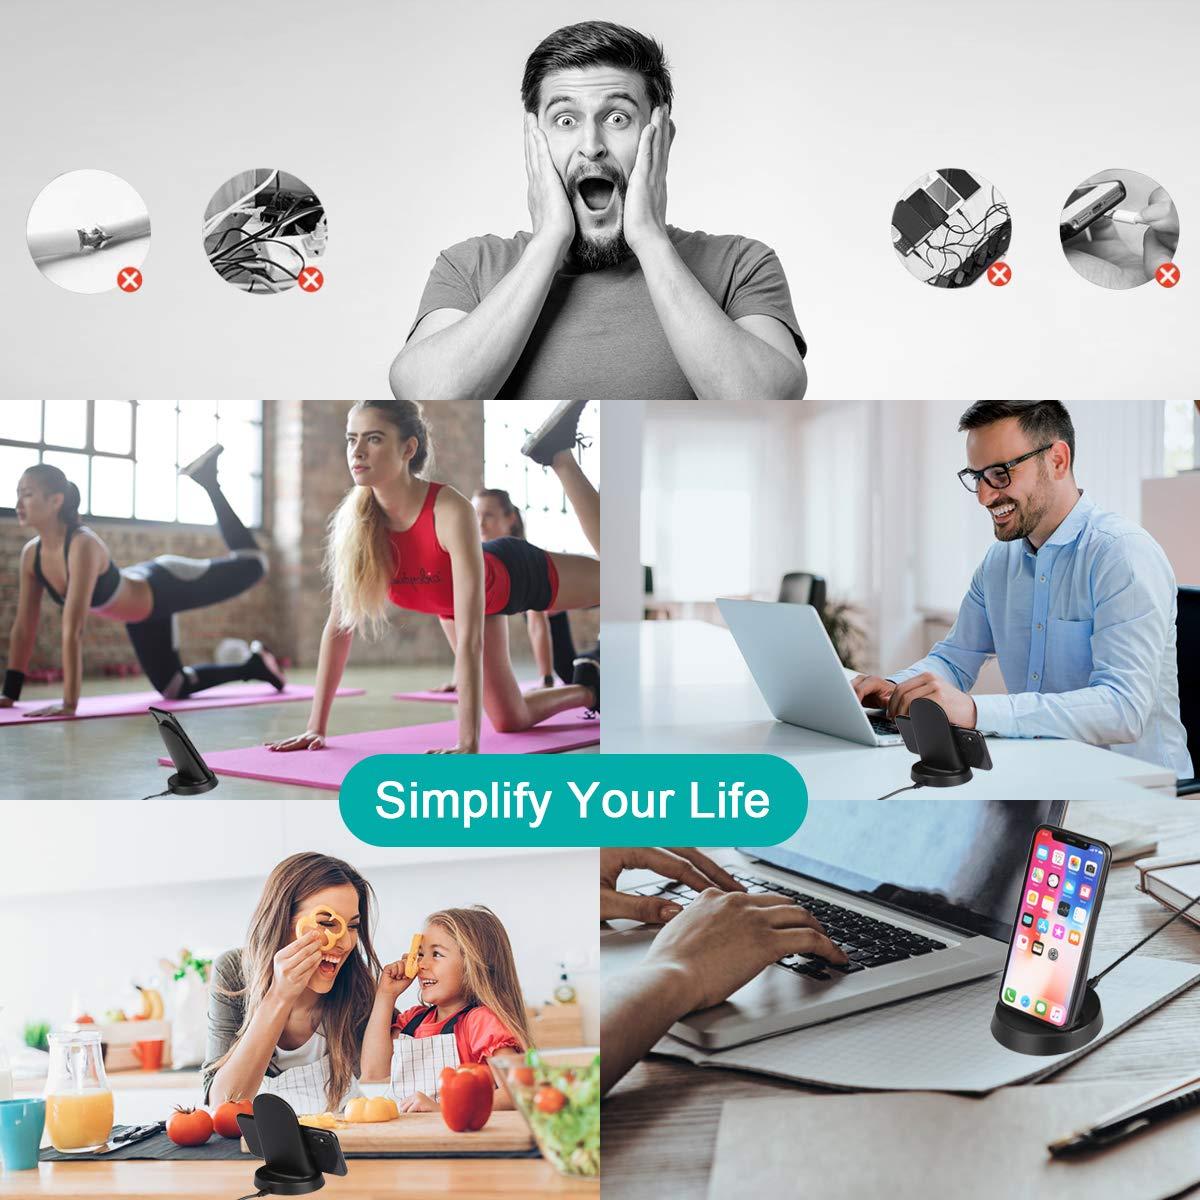 Kdely Cargador Inal/ámbrico etc Cargador Inal/ámbrico R/ápido 10W y Est/ándar 7.5W para iPhone XS//XS MAX//XR//X// 8 Plus//8 e Samsung Galaxy S11 S10 S9 S8 Plus S8 S7 Note8